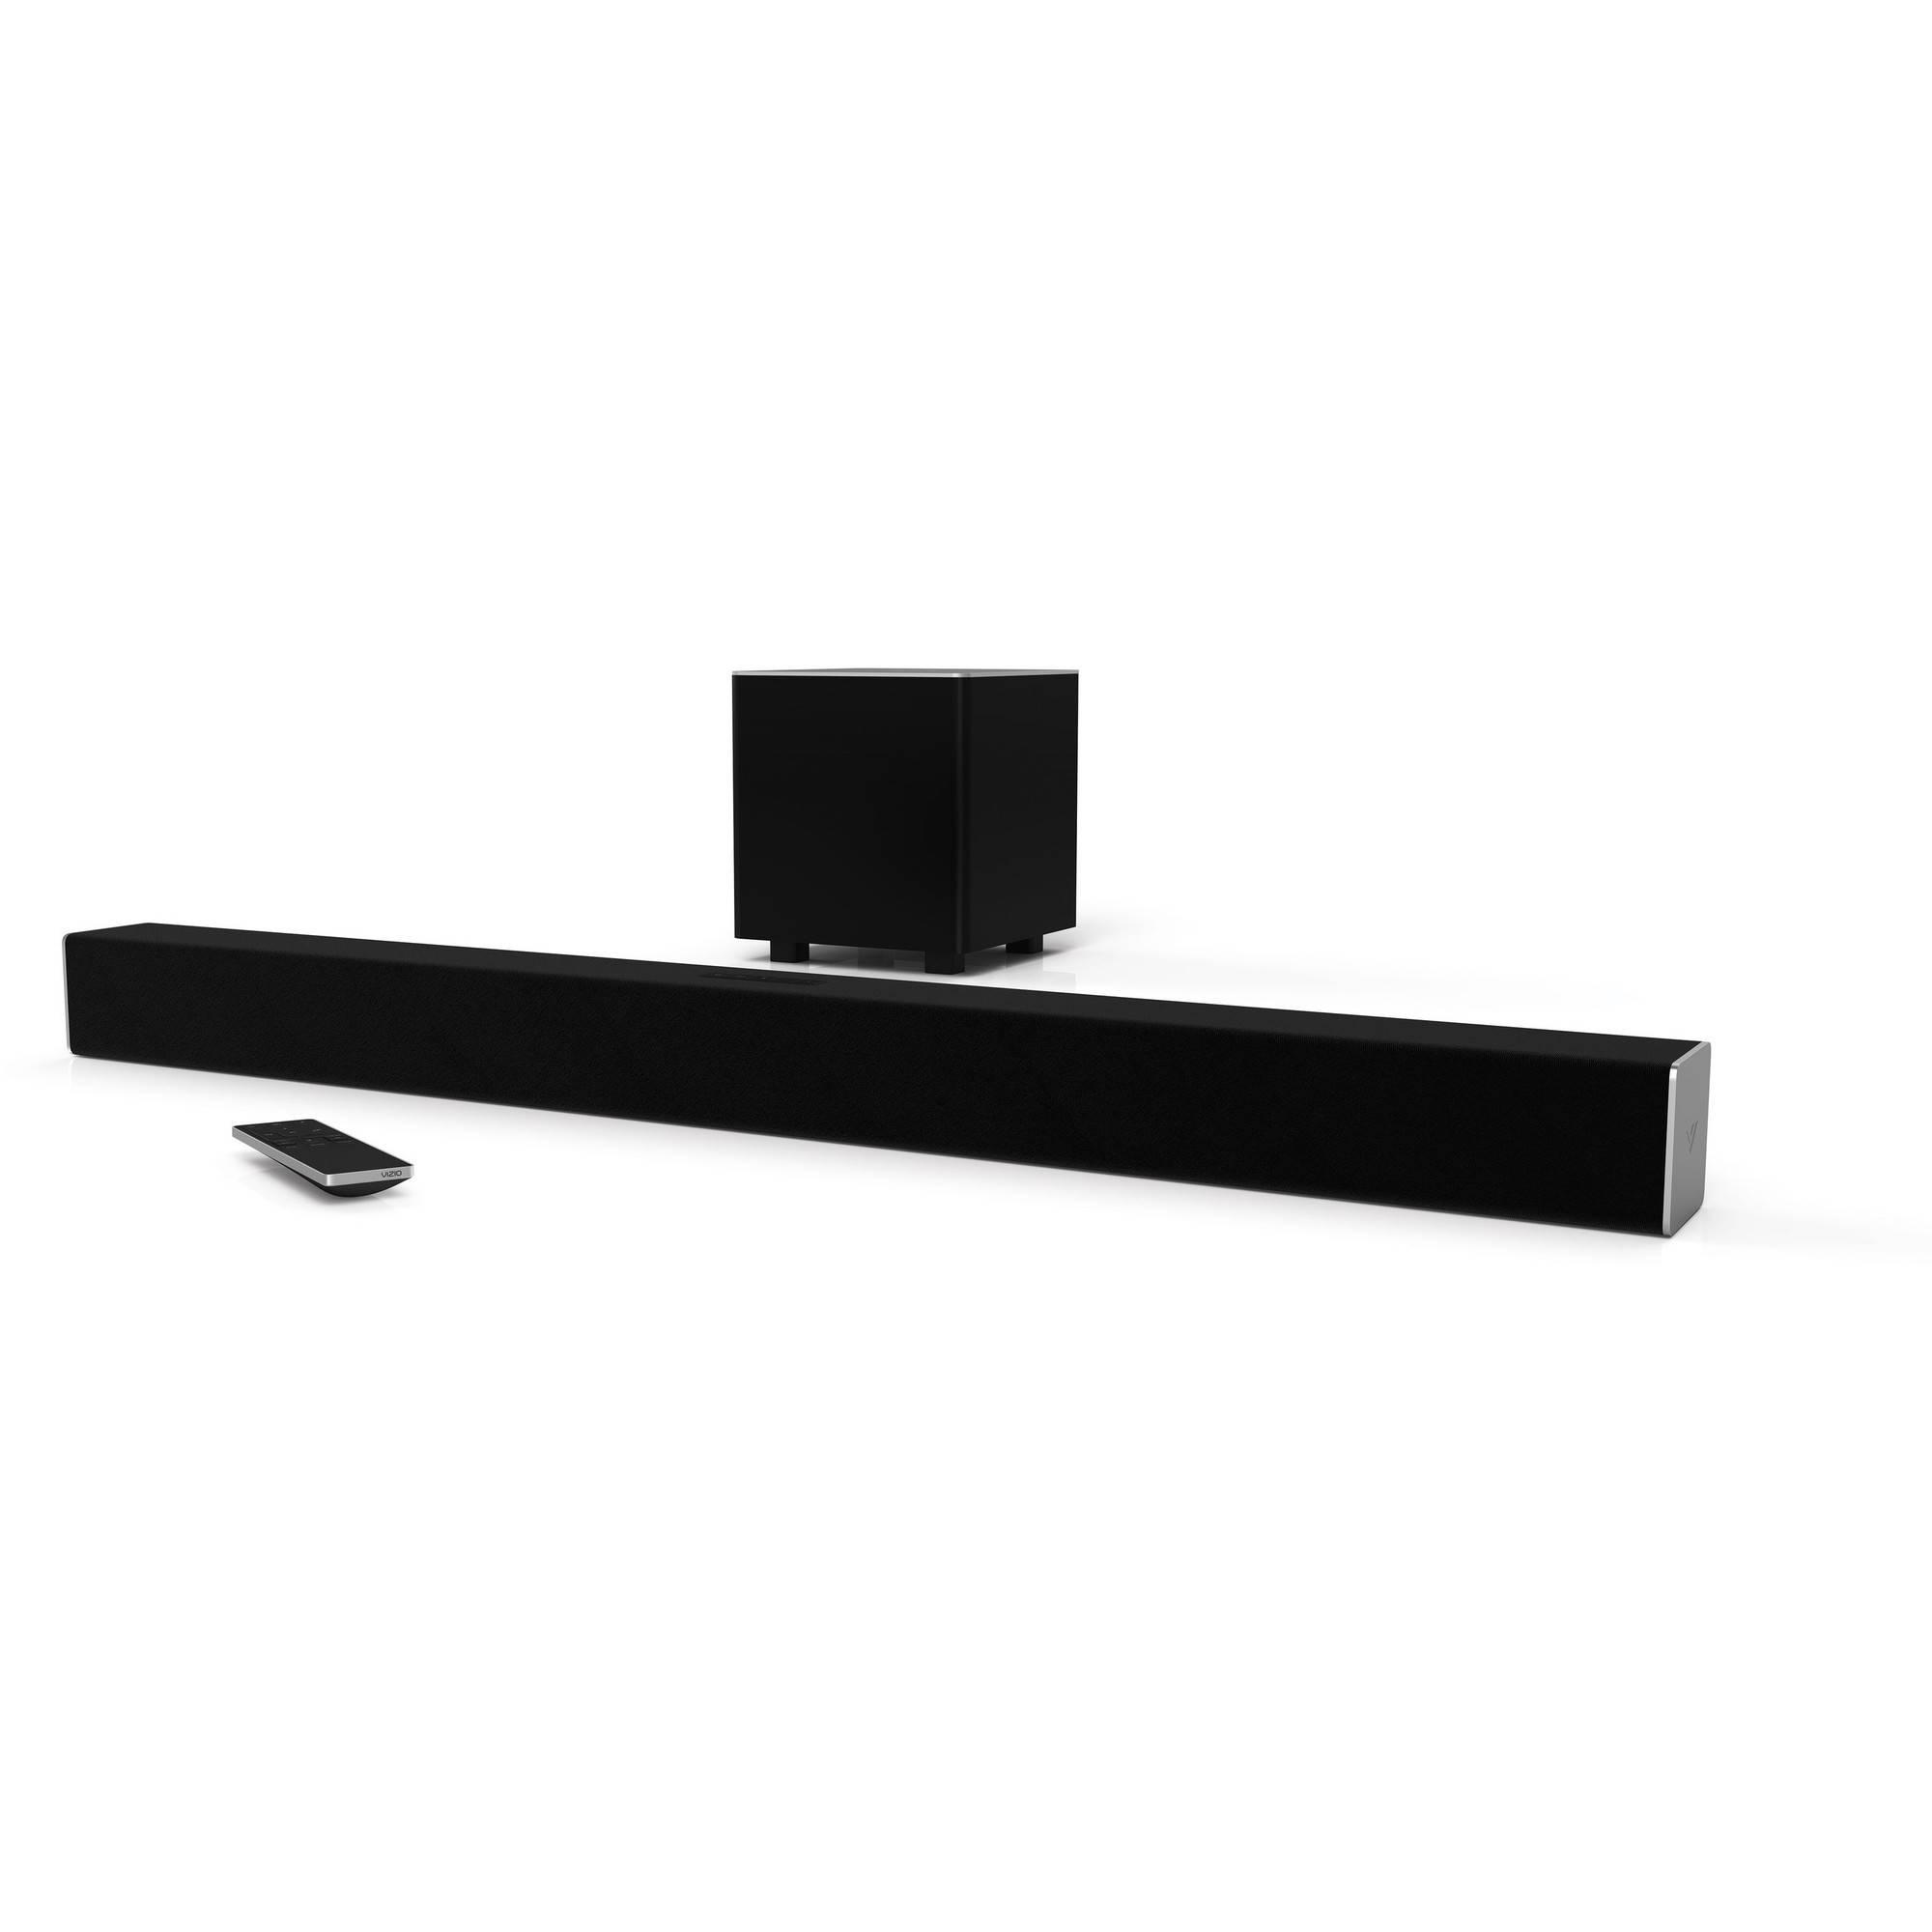 "VIZIO SmartCast SB3821-D6 38"" 2.1 Sound Bar System $99.99"